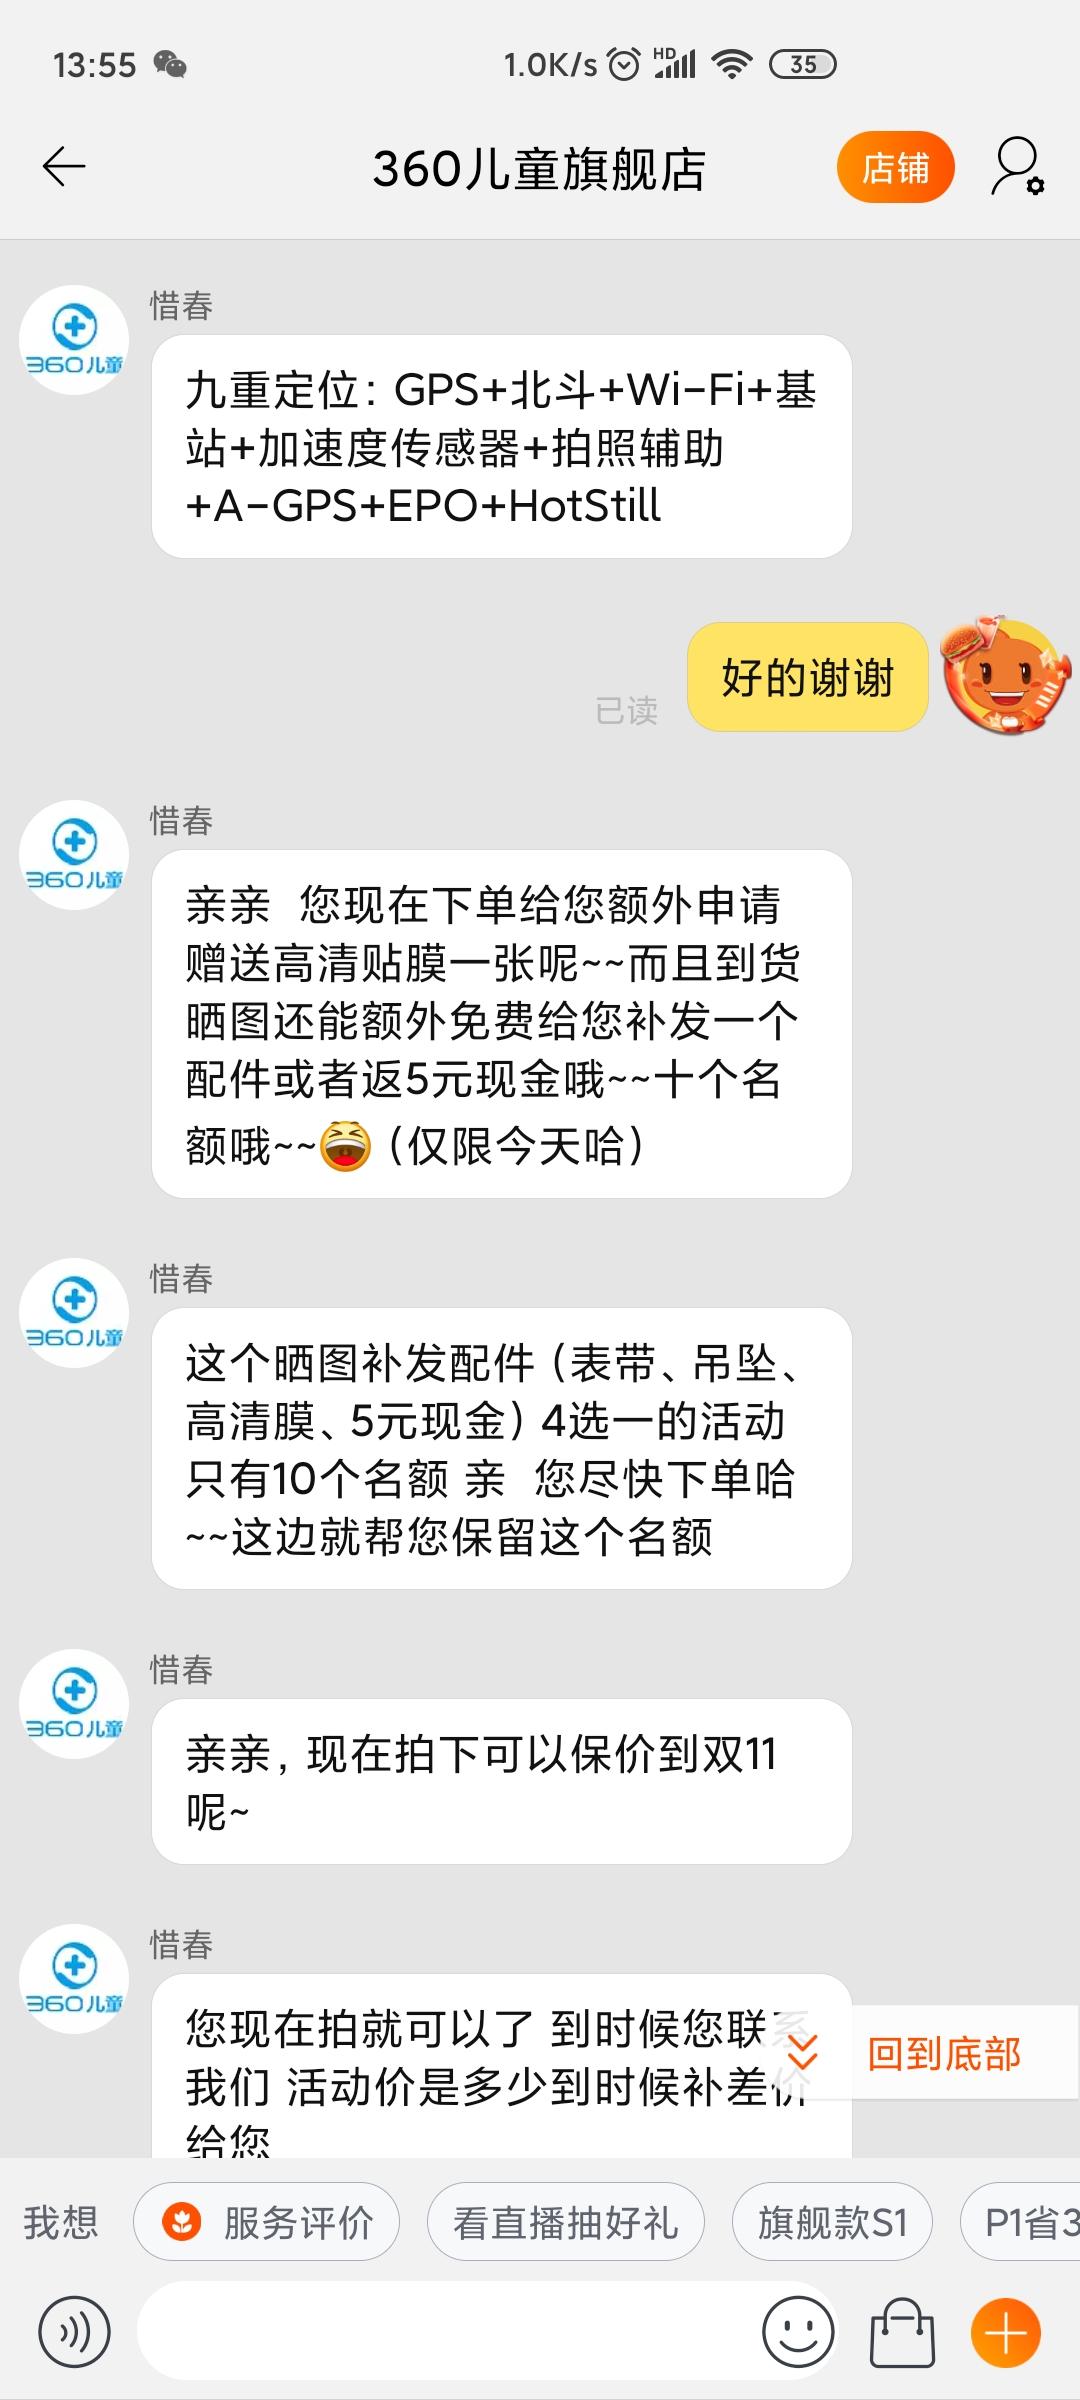 Screenshot_2020-10-14-13-55-04-242_com.taobao.taobao.jpg